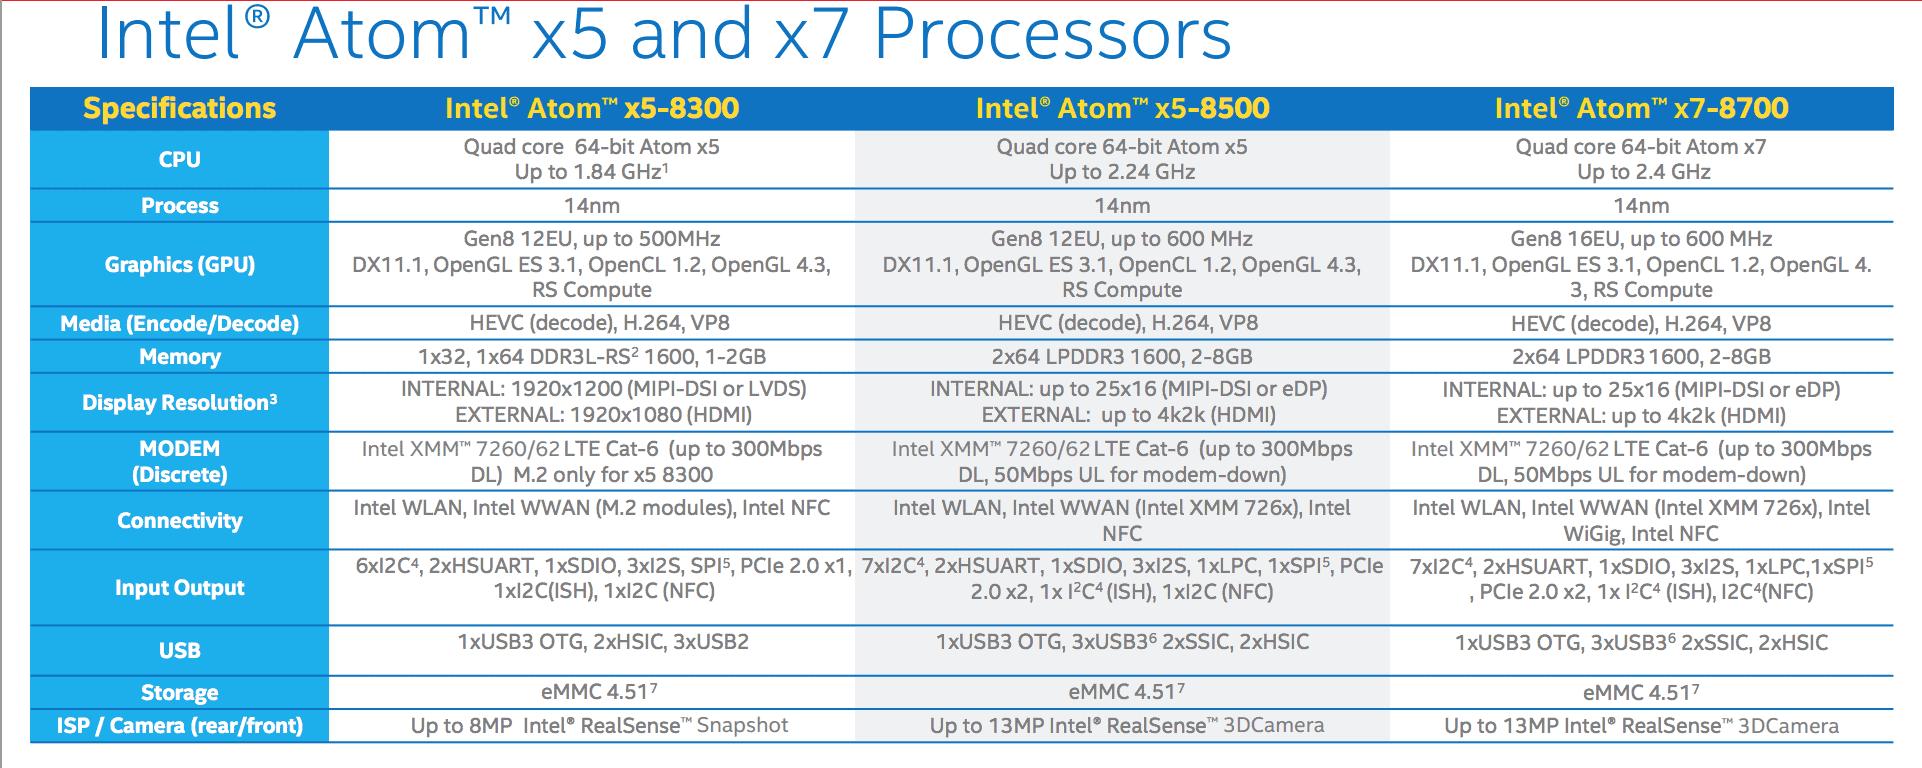 Intel Atom X5 and X7